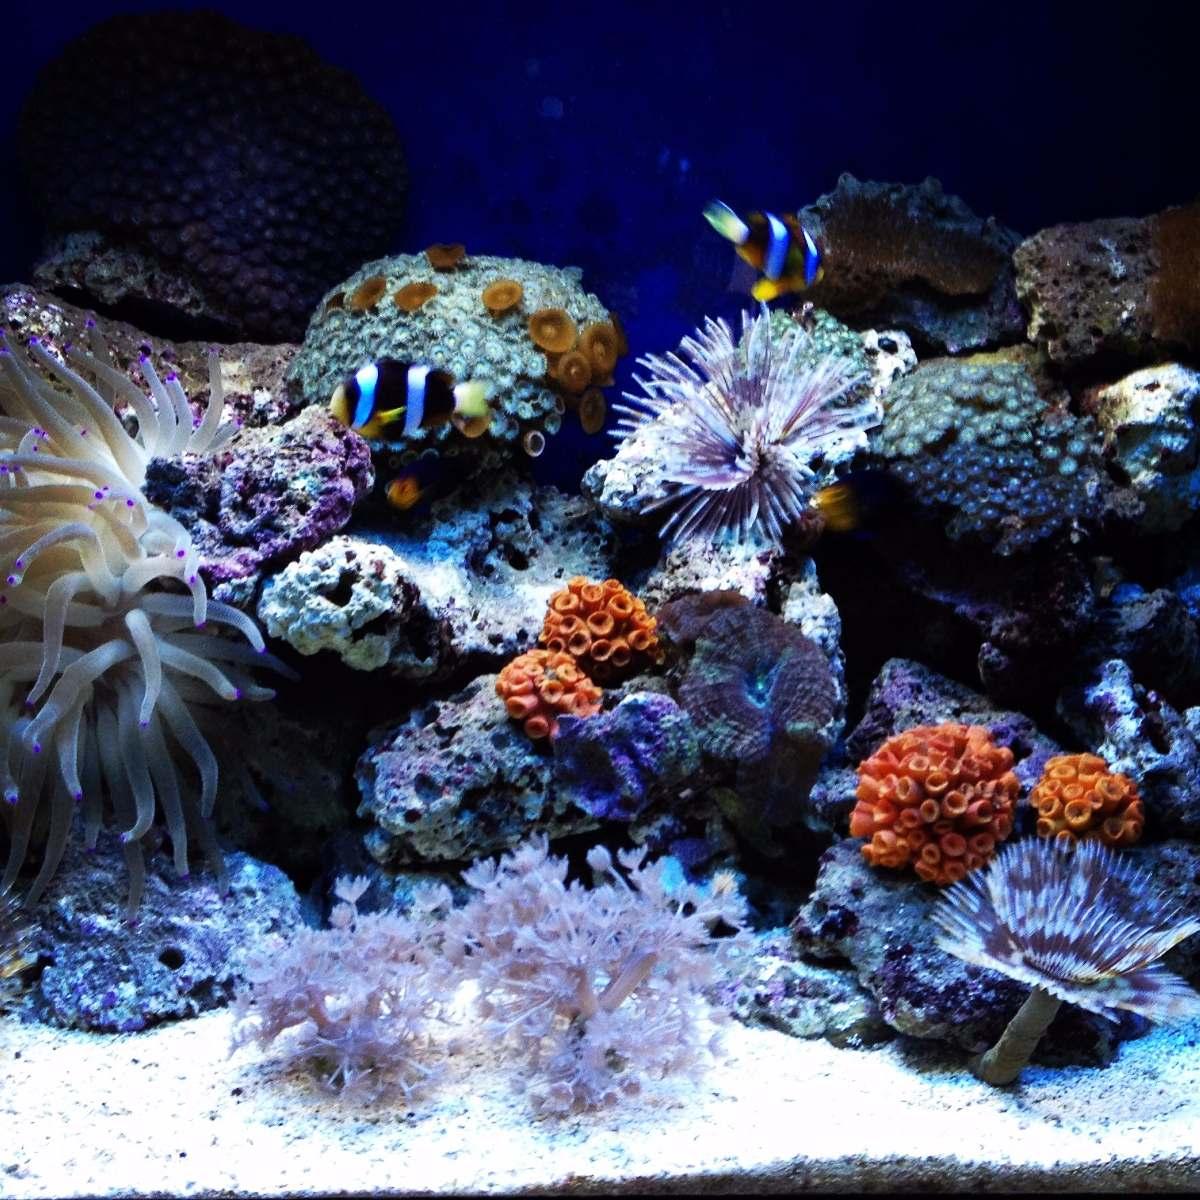 Venta de agua salada para acuarios marinos sal marina for Compro estanque de agua